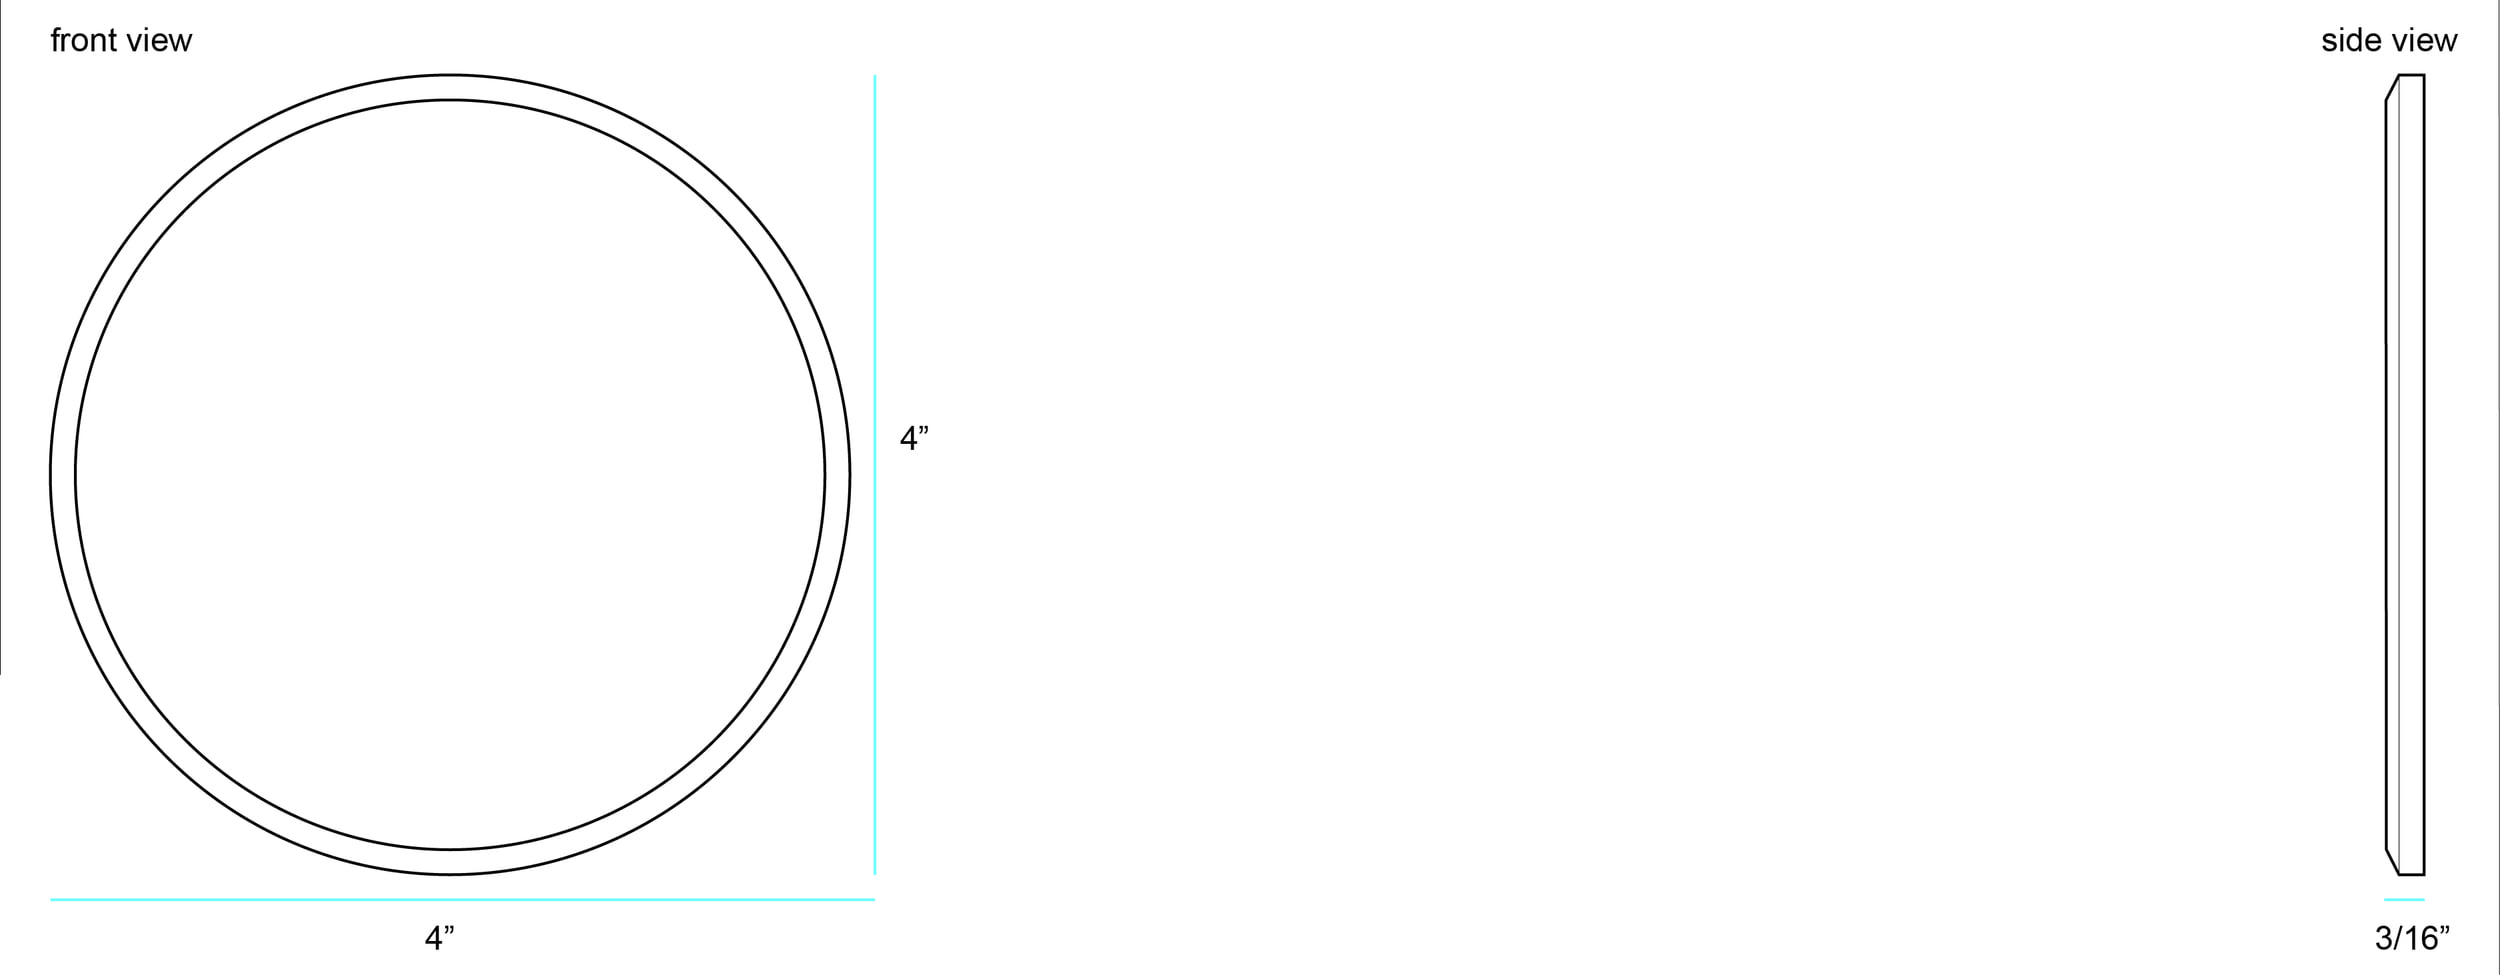 4_circular.jpg copy.jpg